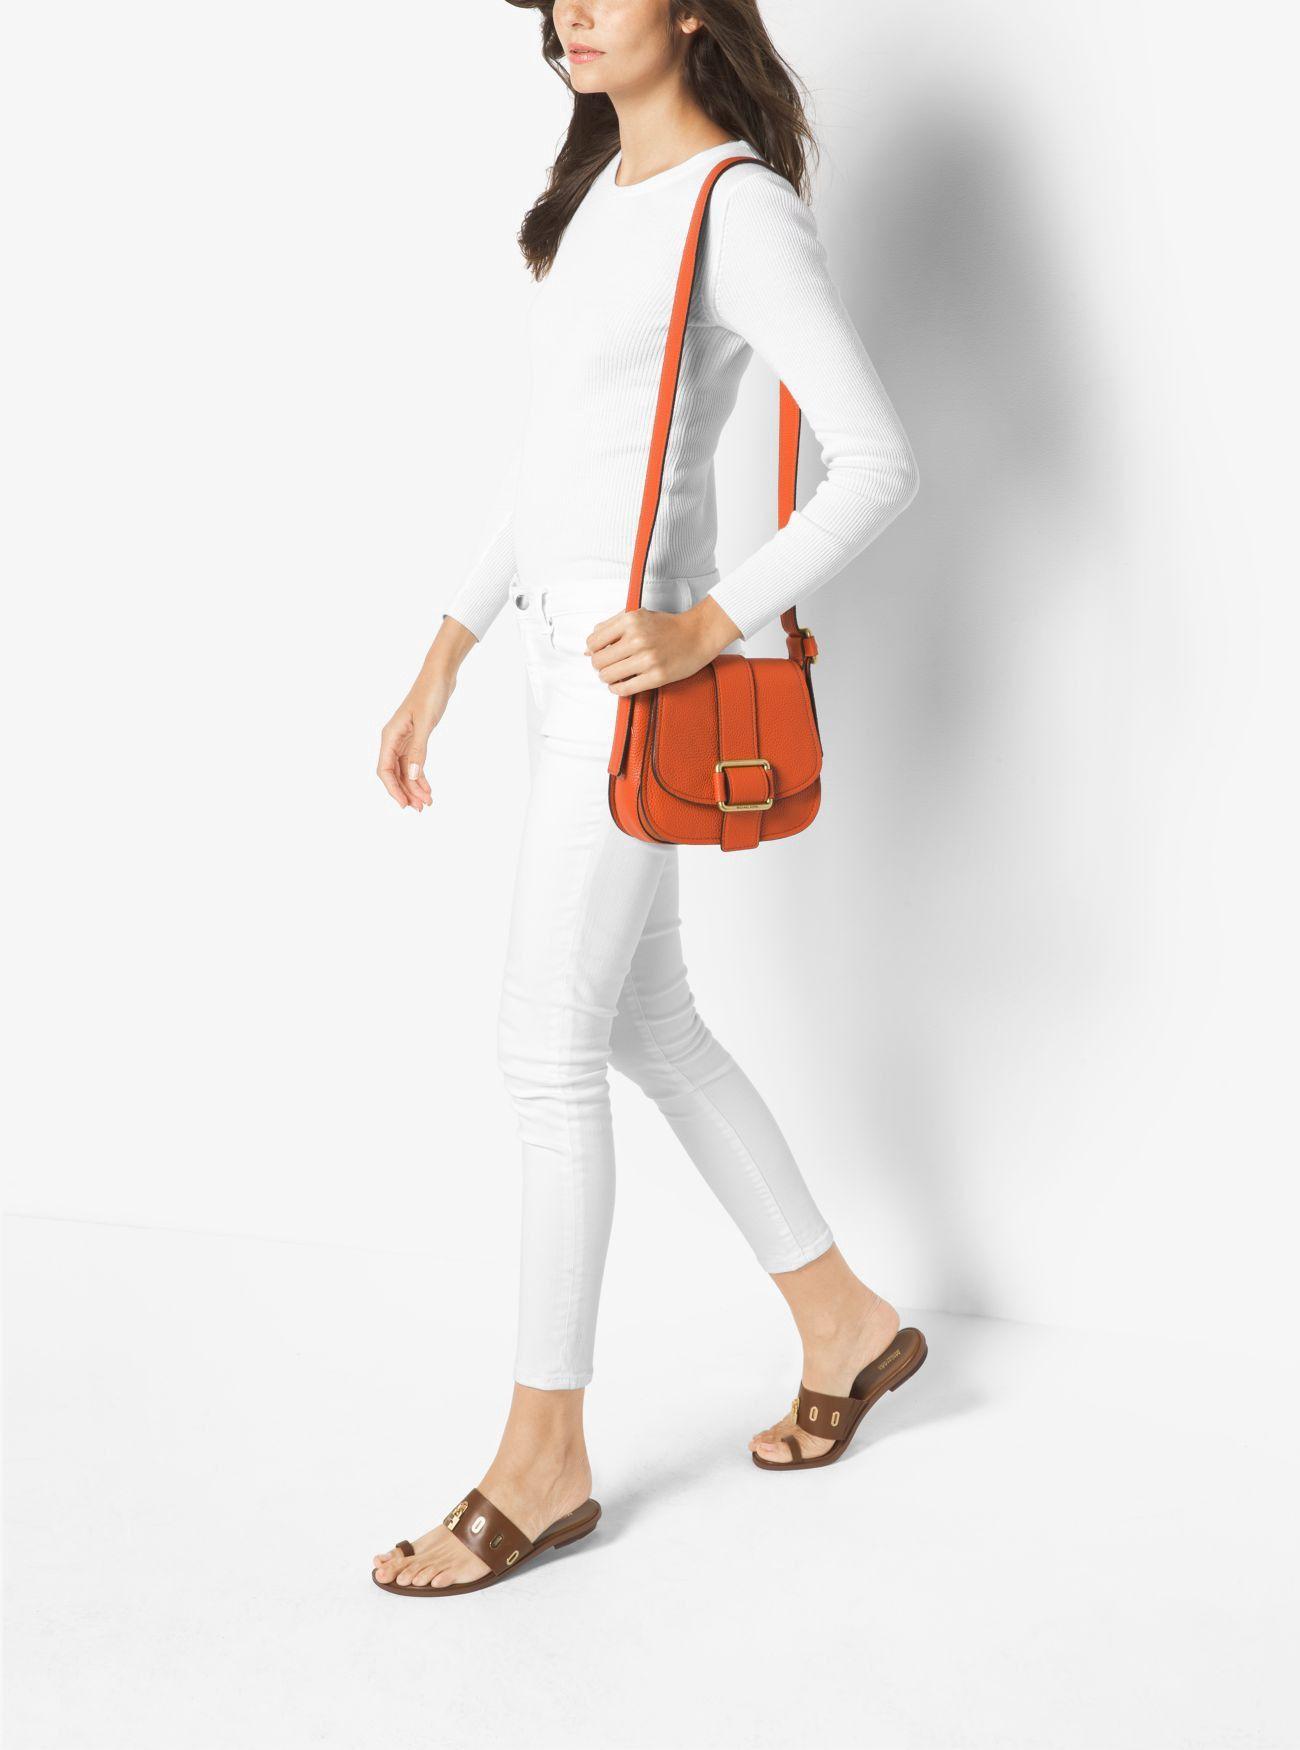 ee76495f0e9dd MICHAEL KORS Maxine Medium Leather Saddlebag.  michaelkors  bags  leather   lining  travel bags  weekend  polyester